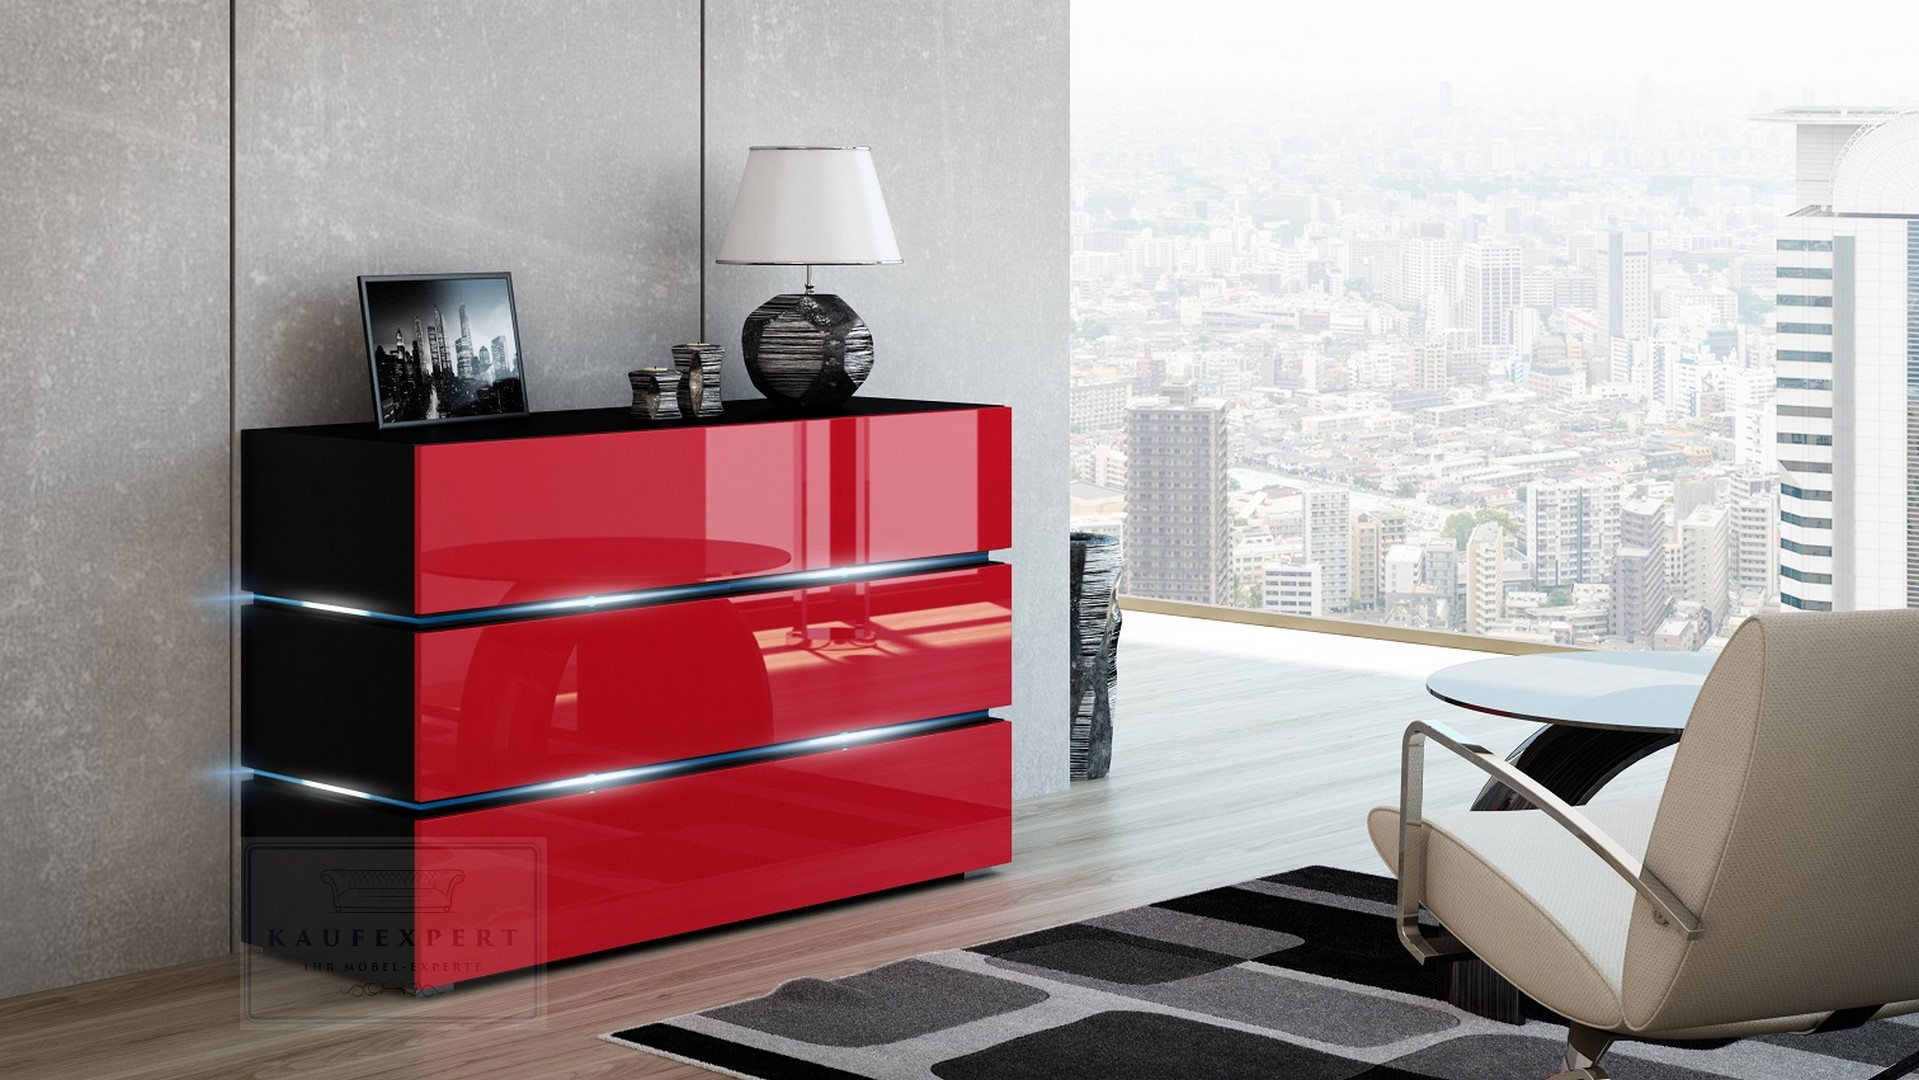 Kaufexpert Kommode Shine Sideboard 90 Cm Rot Hochglanz Schwarz Led